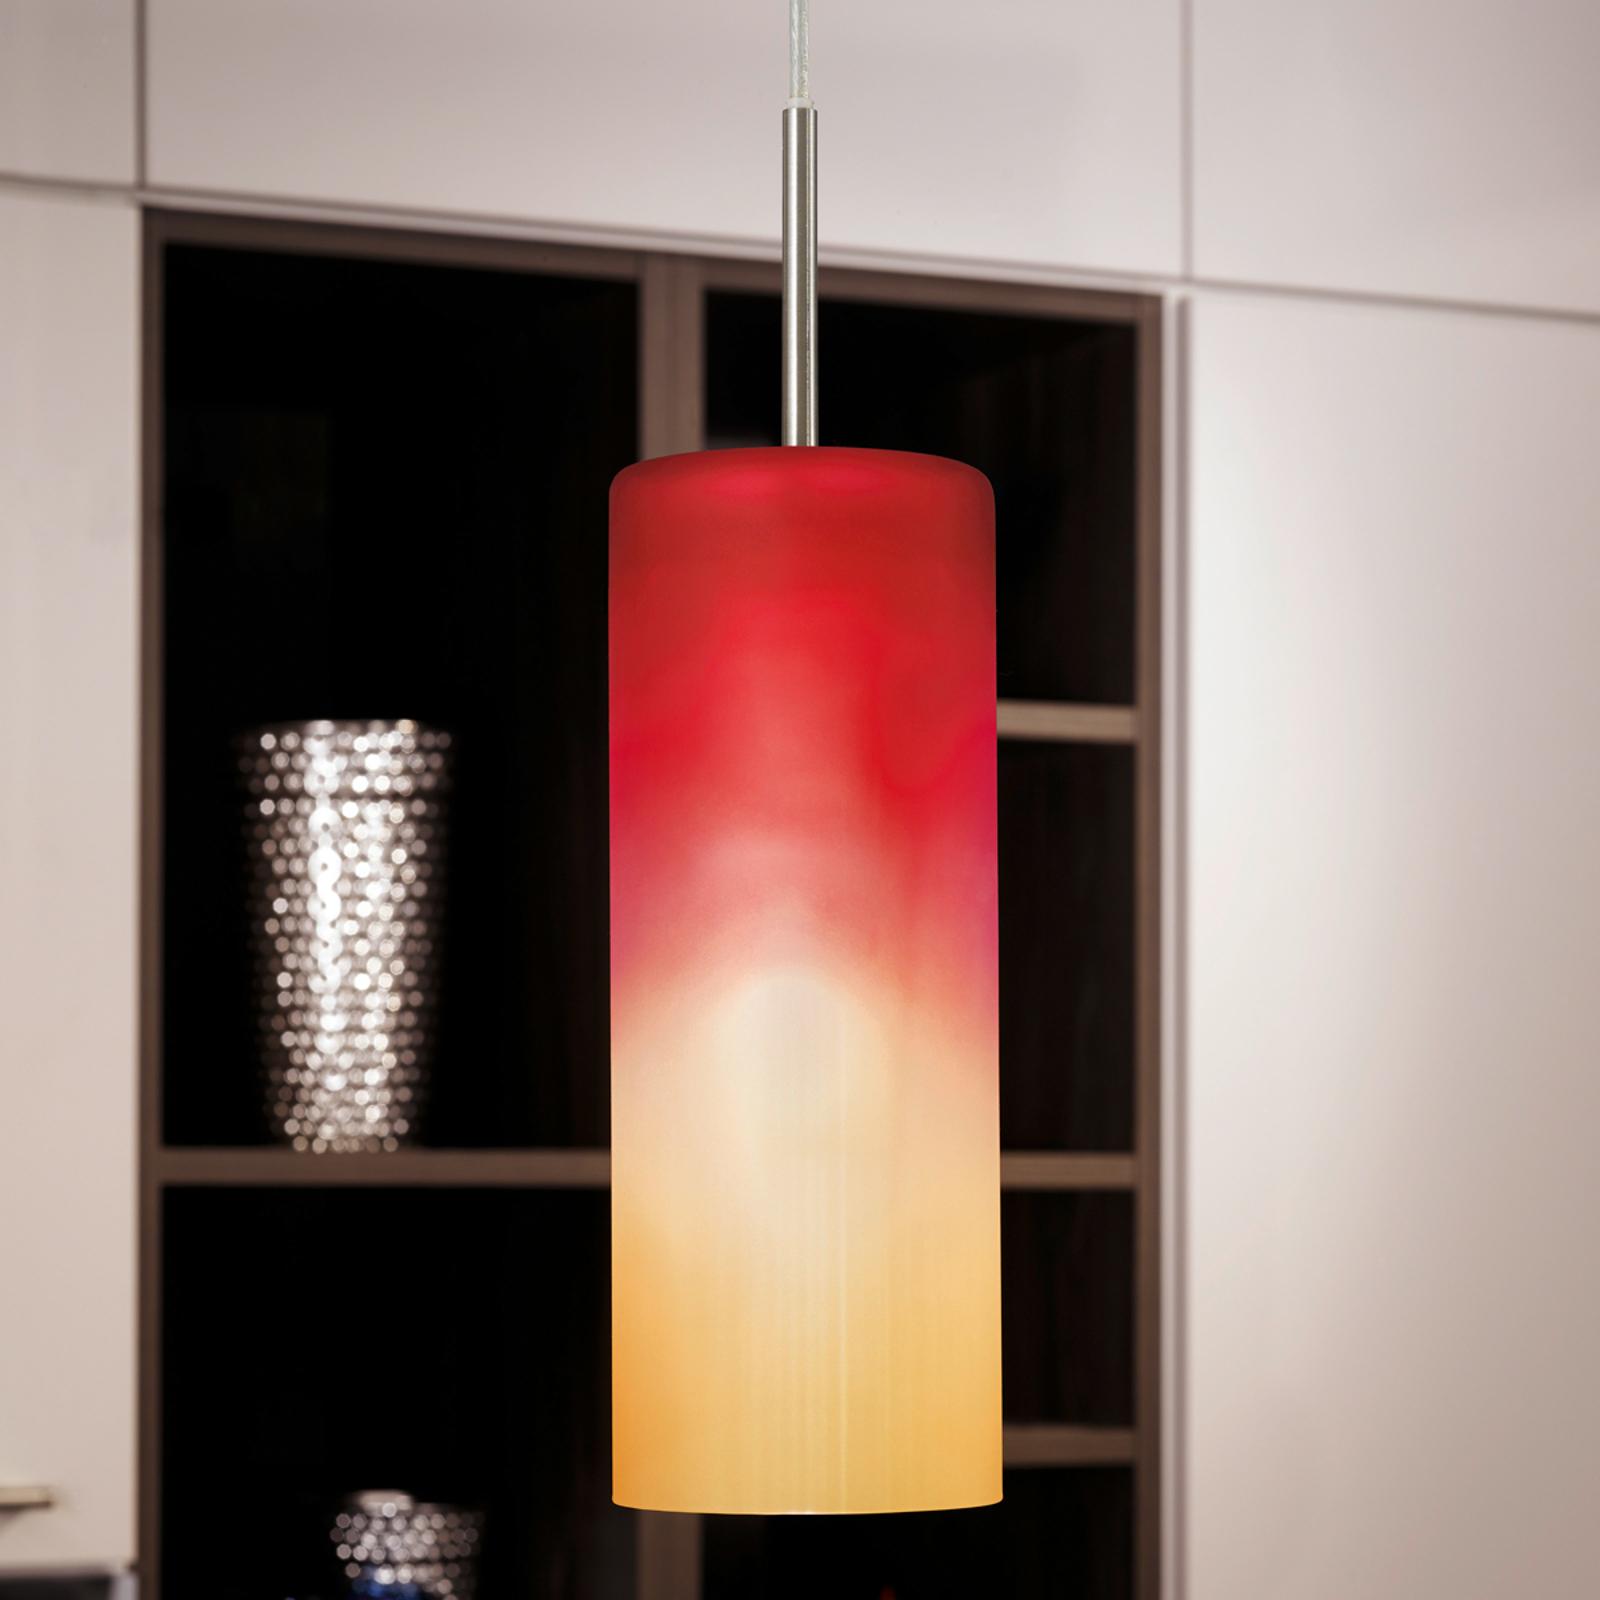 Decoratieve hanglamp TROY oranje rood